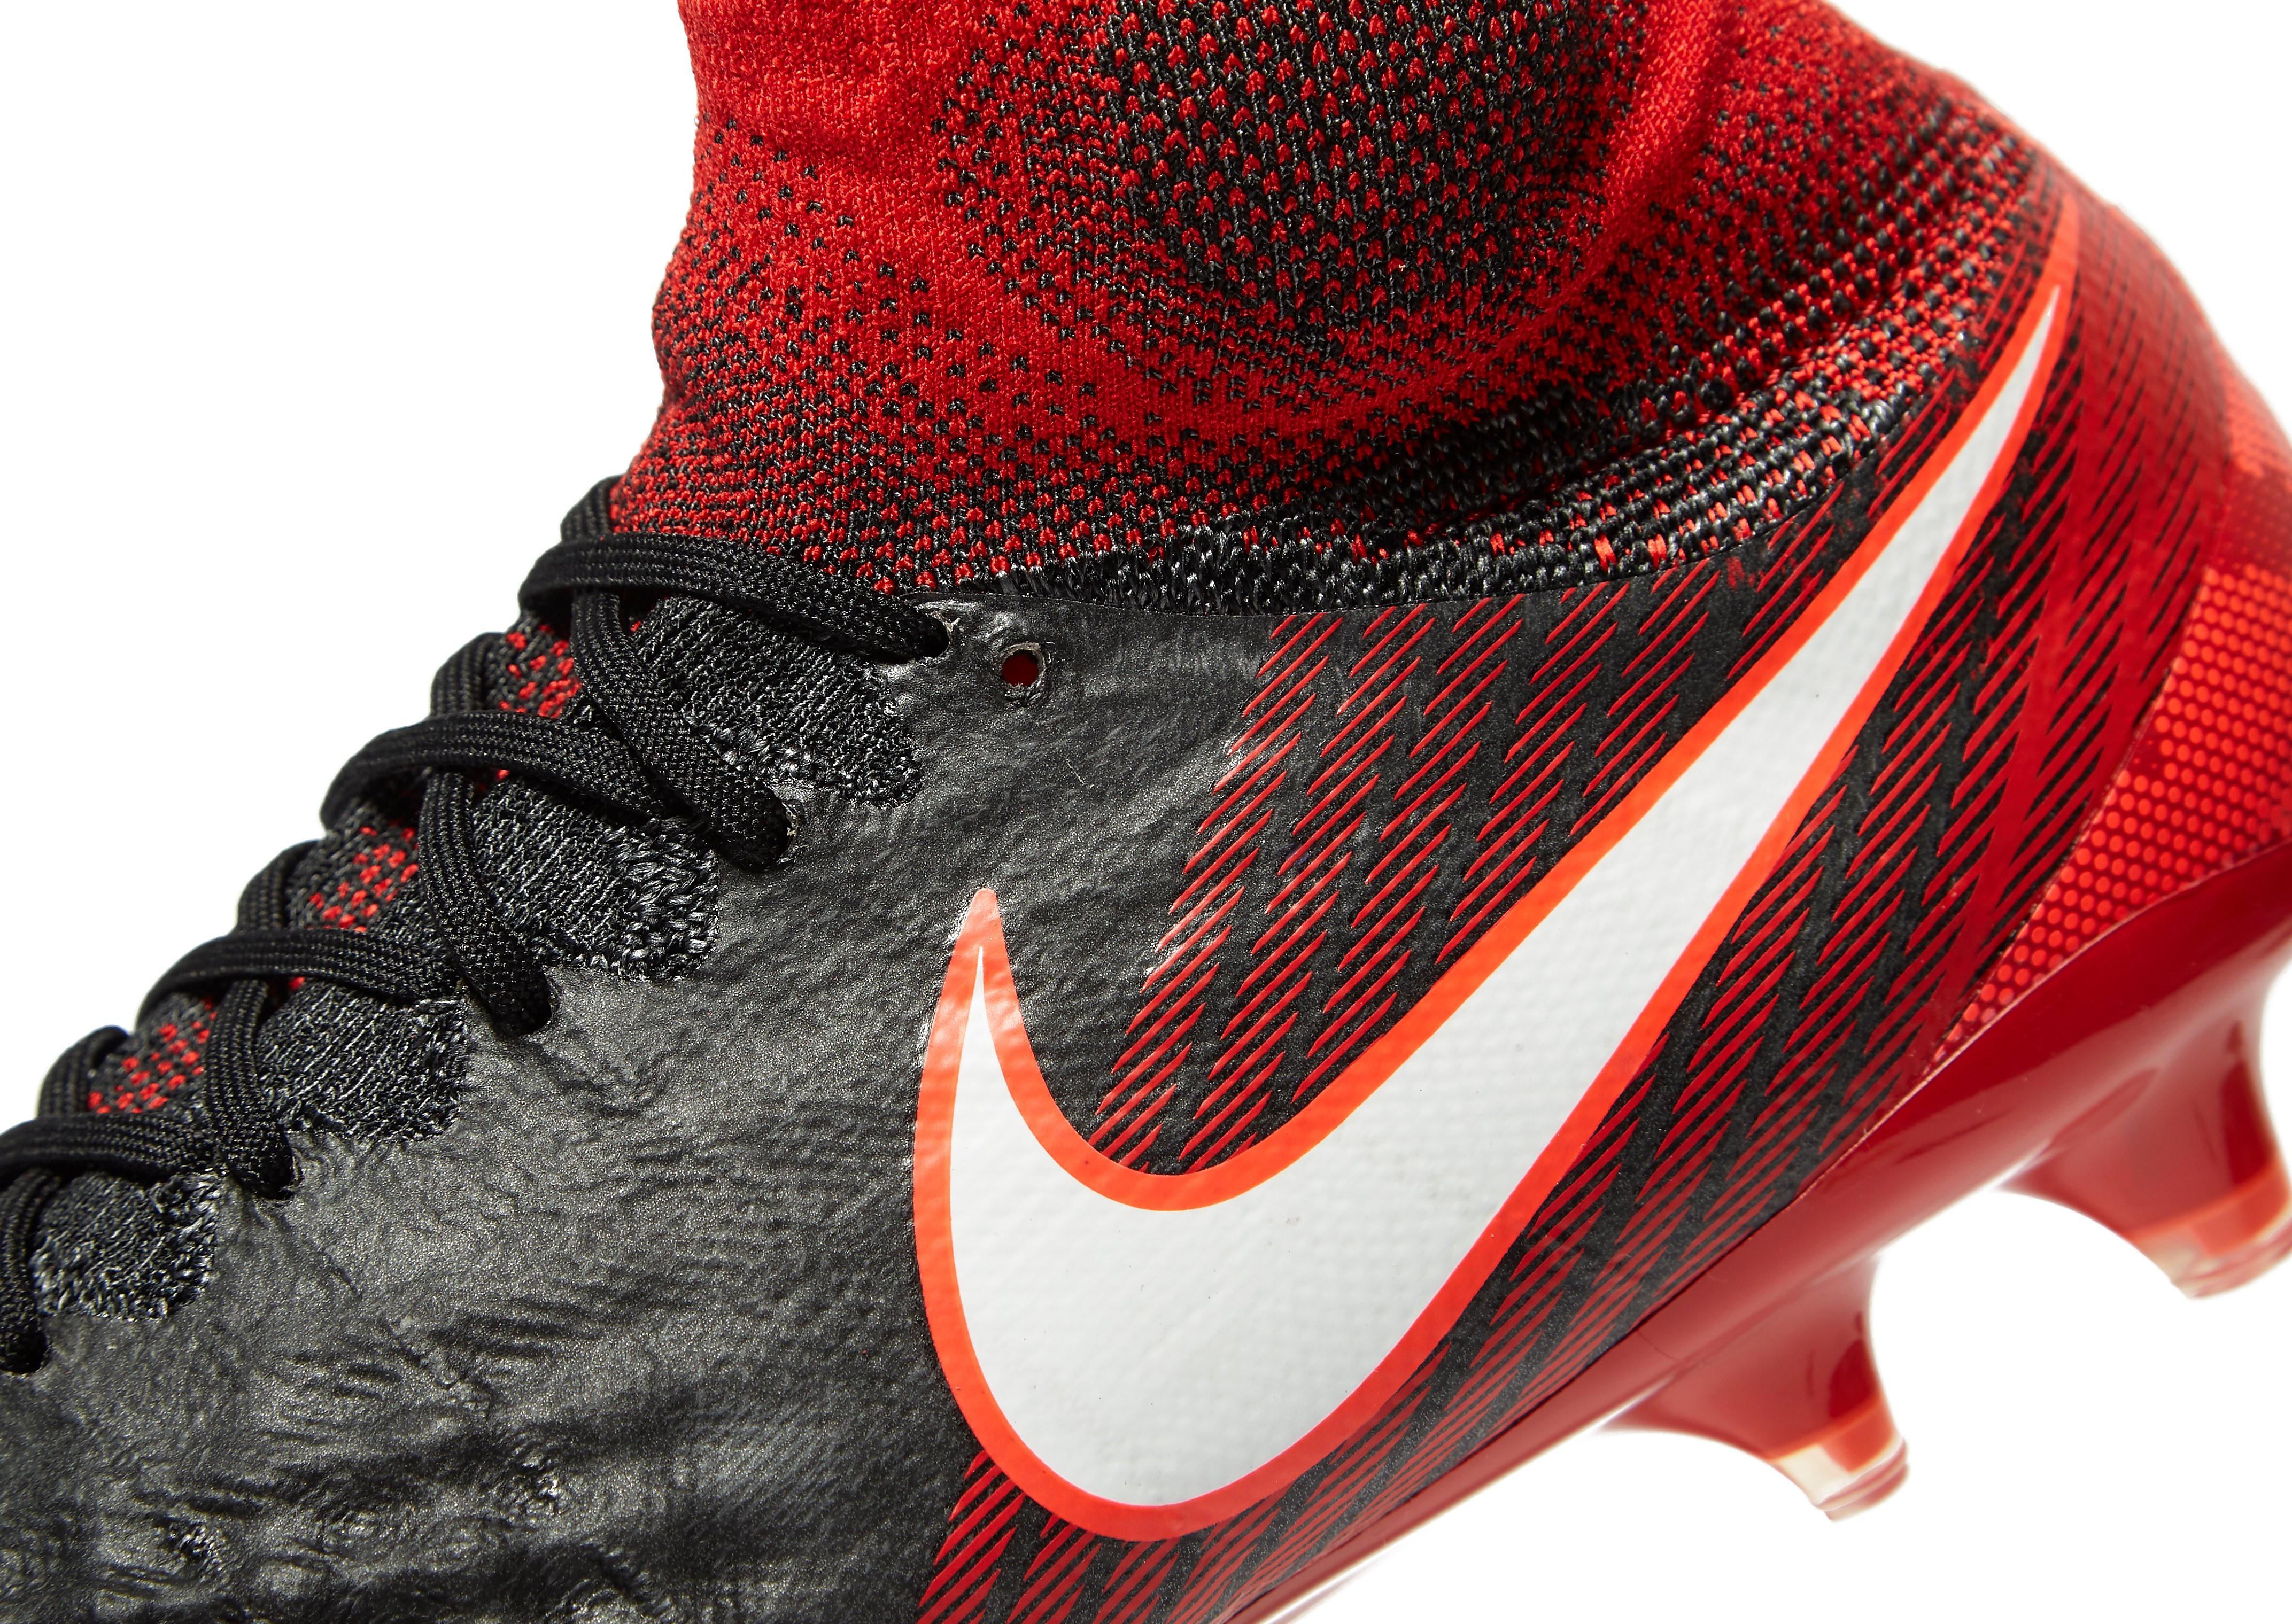 Nike Fire and Ice Magista Obra FG